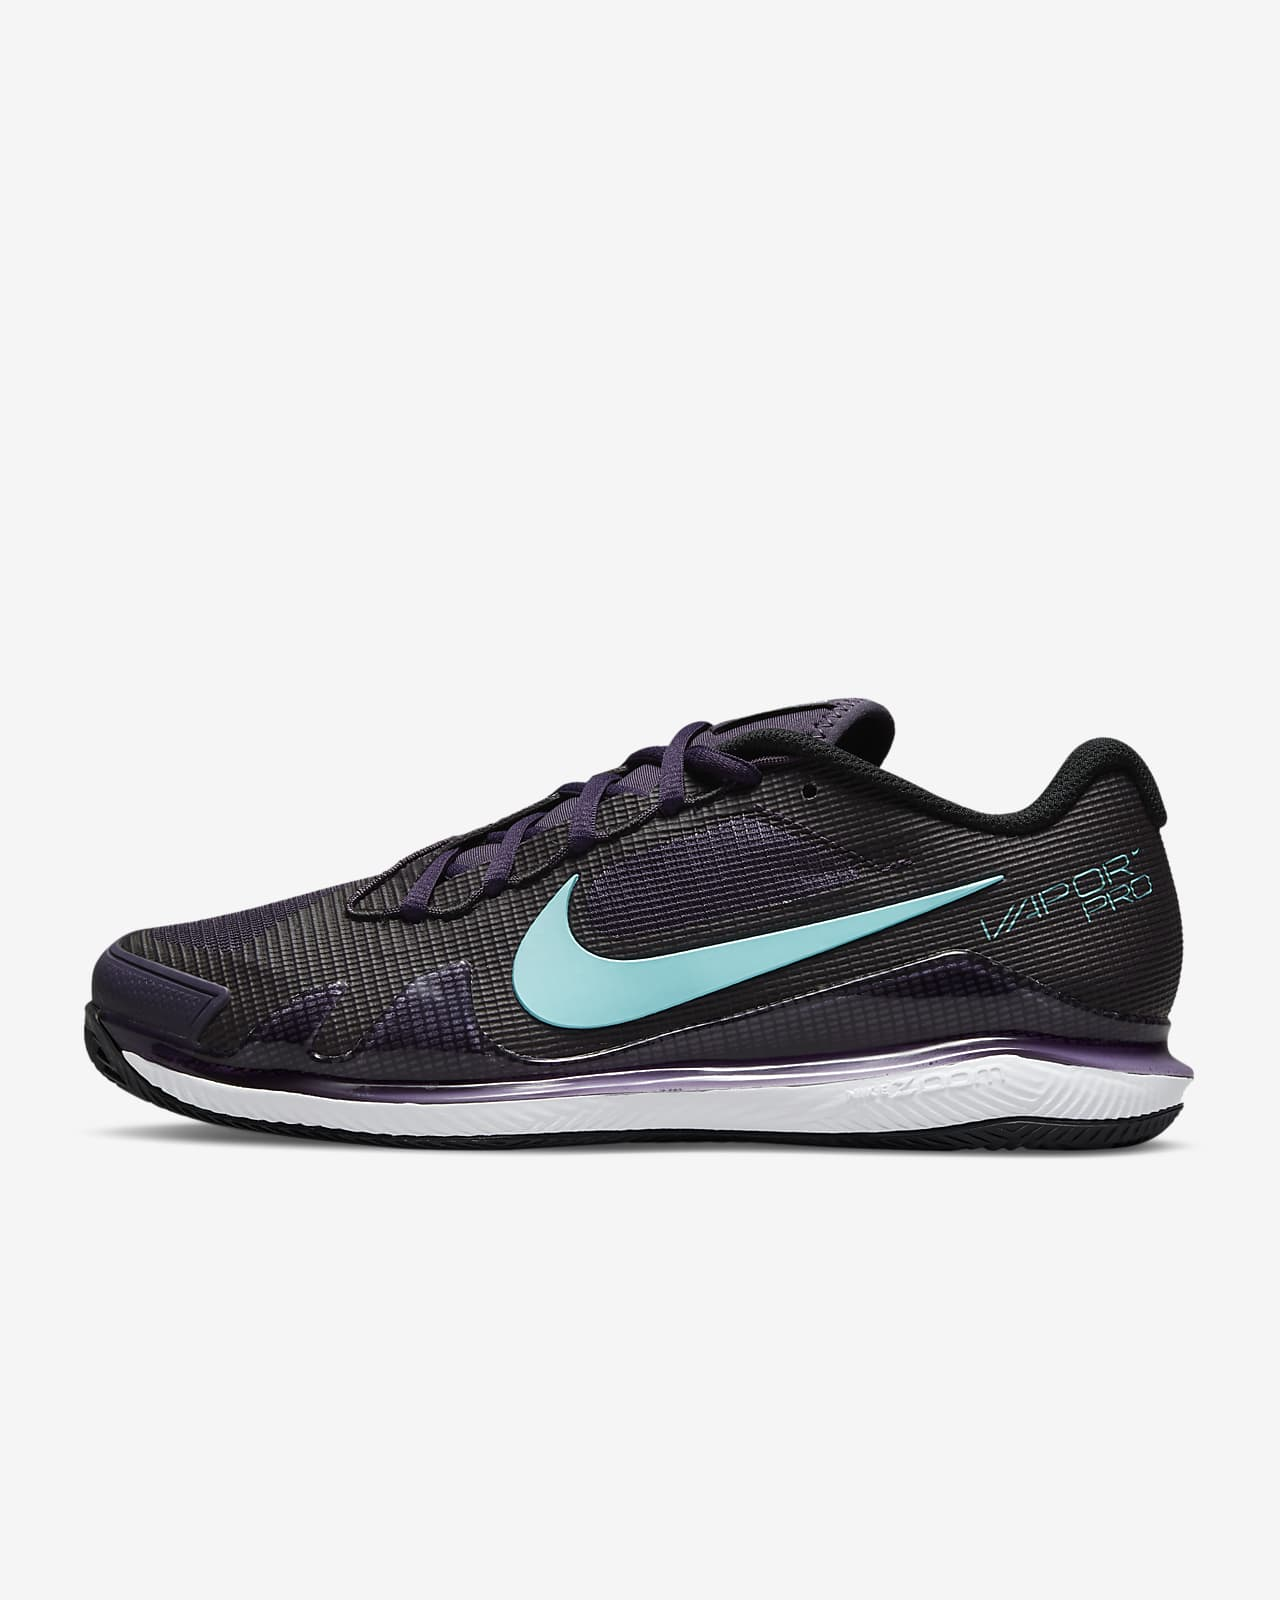 Calzado de tenis para cancha de arcilla para mujer NikeCourt Air Zoom Vapor Pro